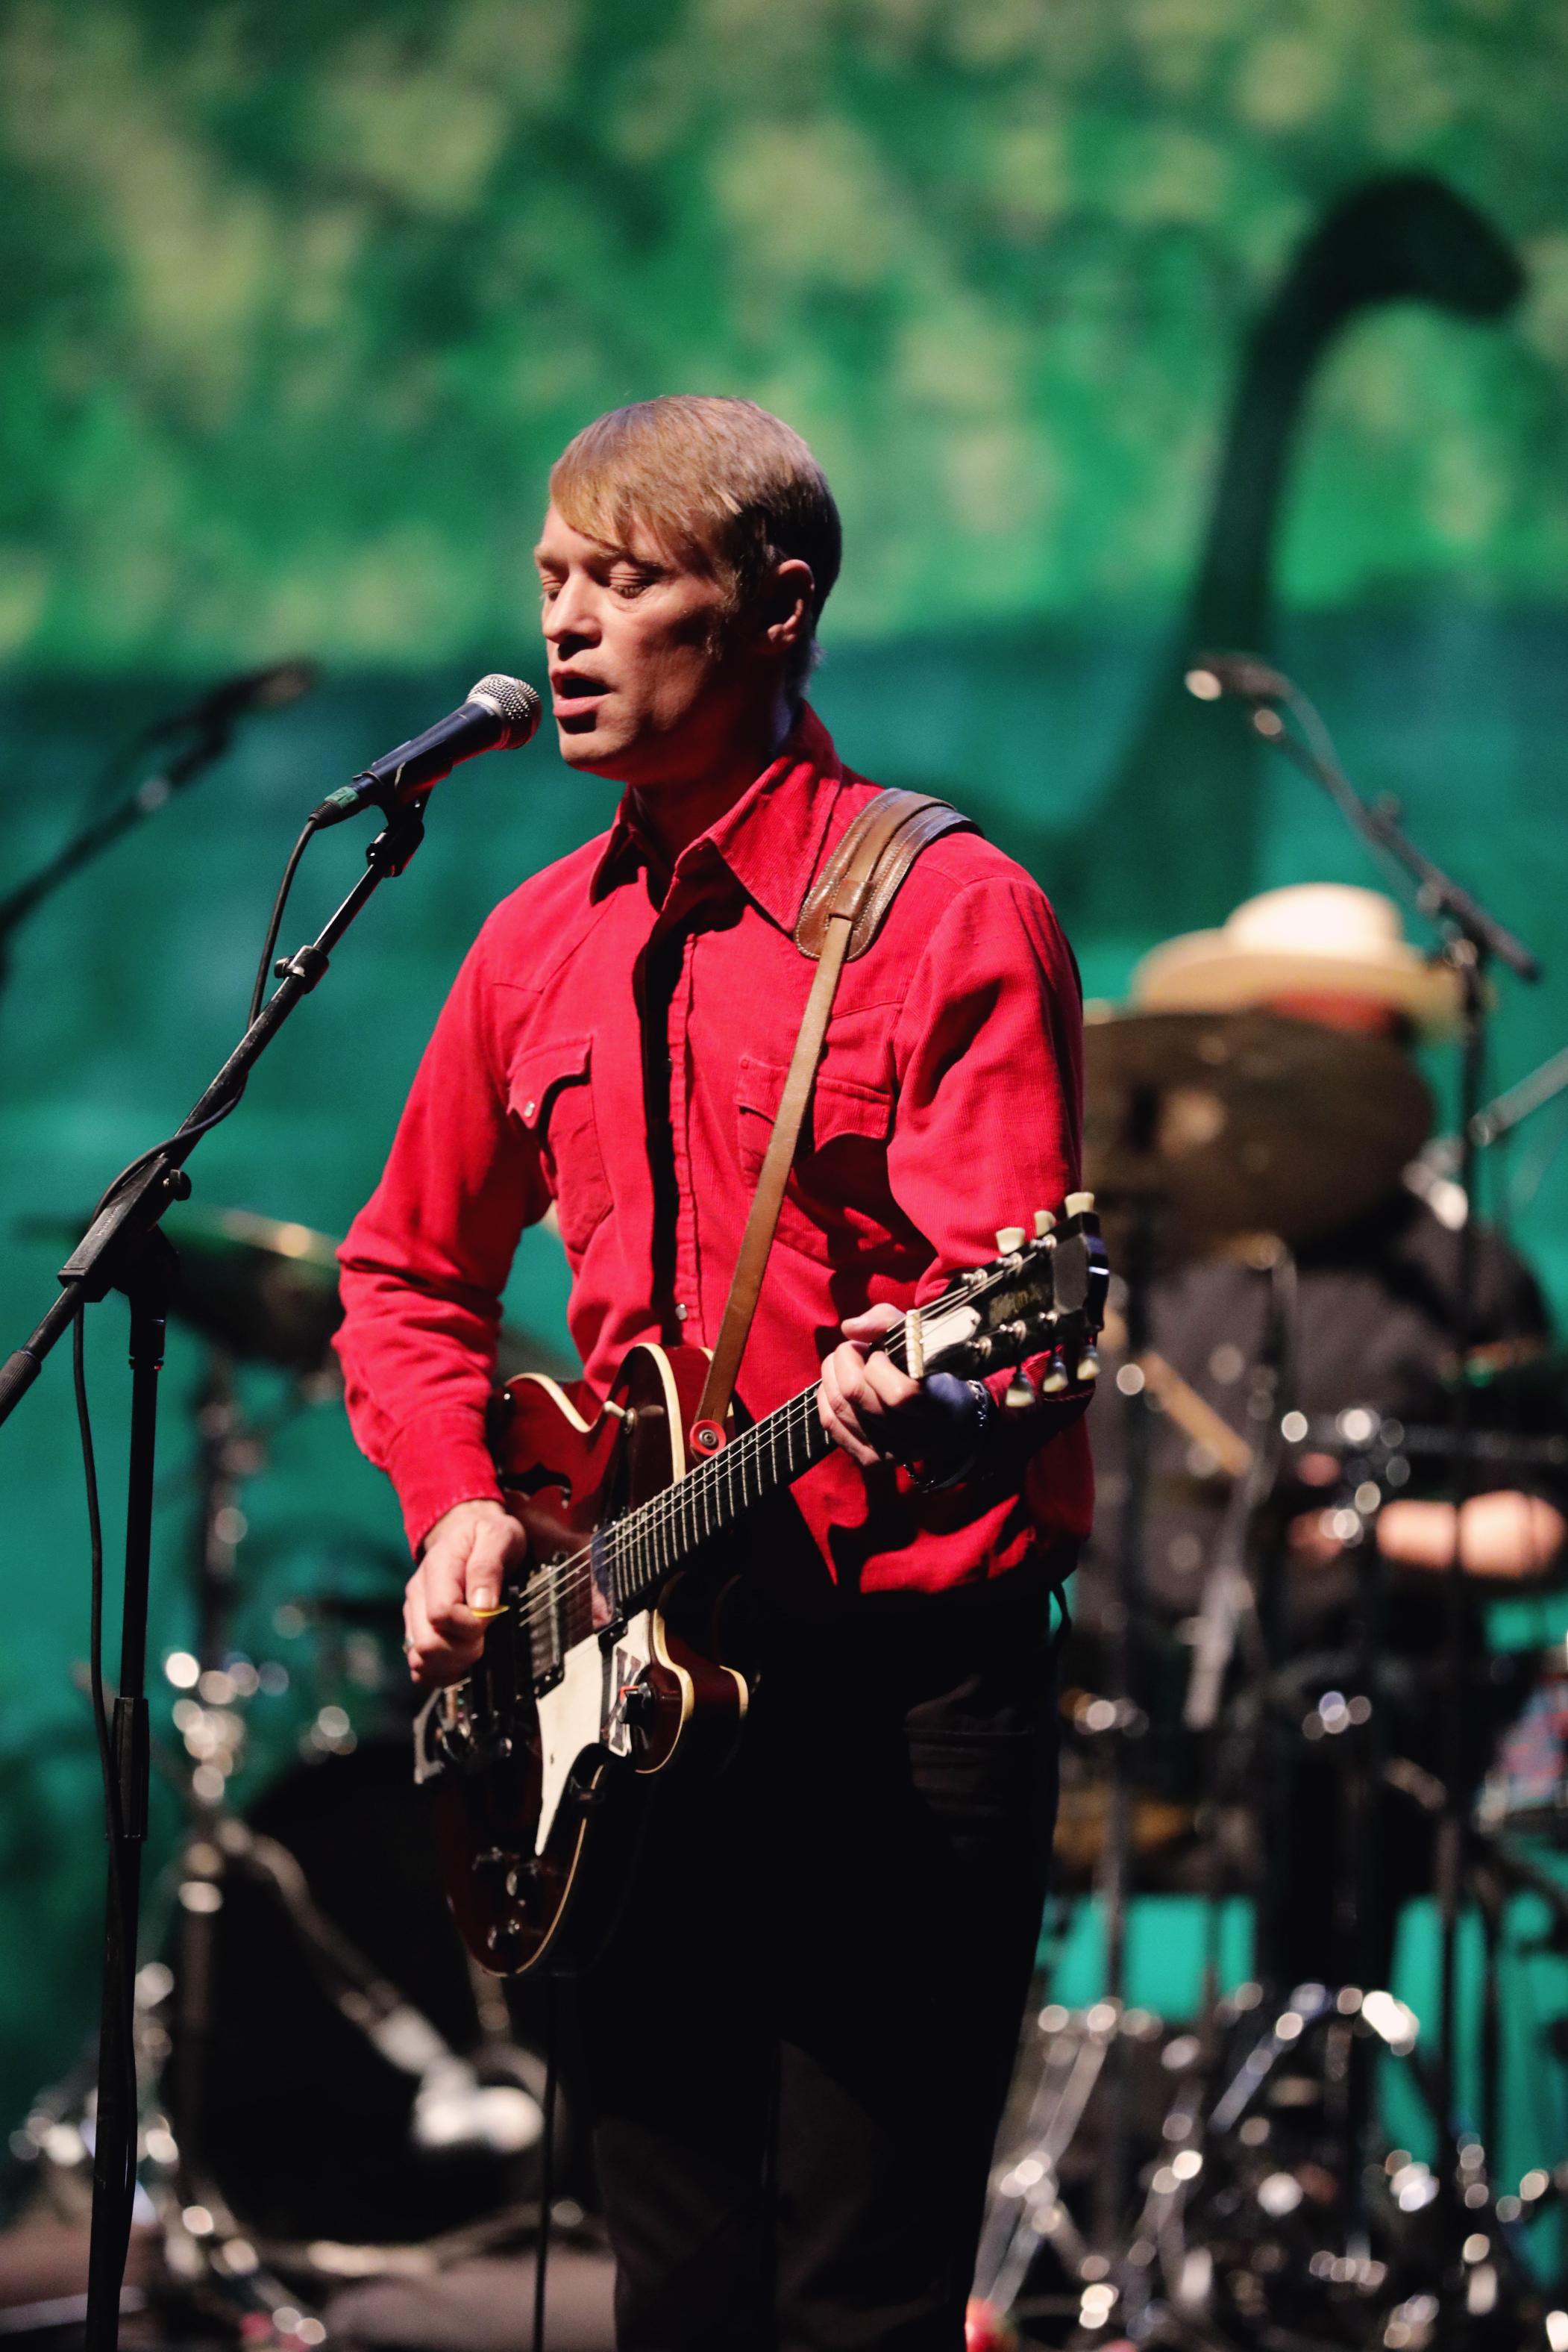 Gabe Nelson, bass player for CAKE. Photo: Lmsorenson.net